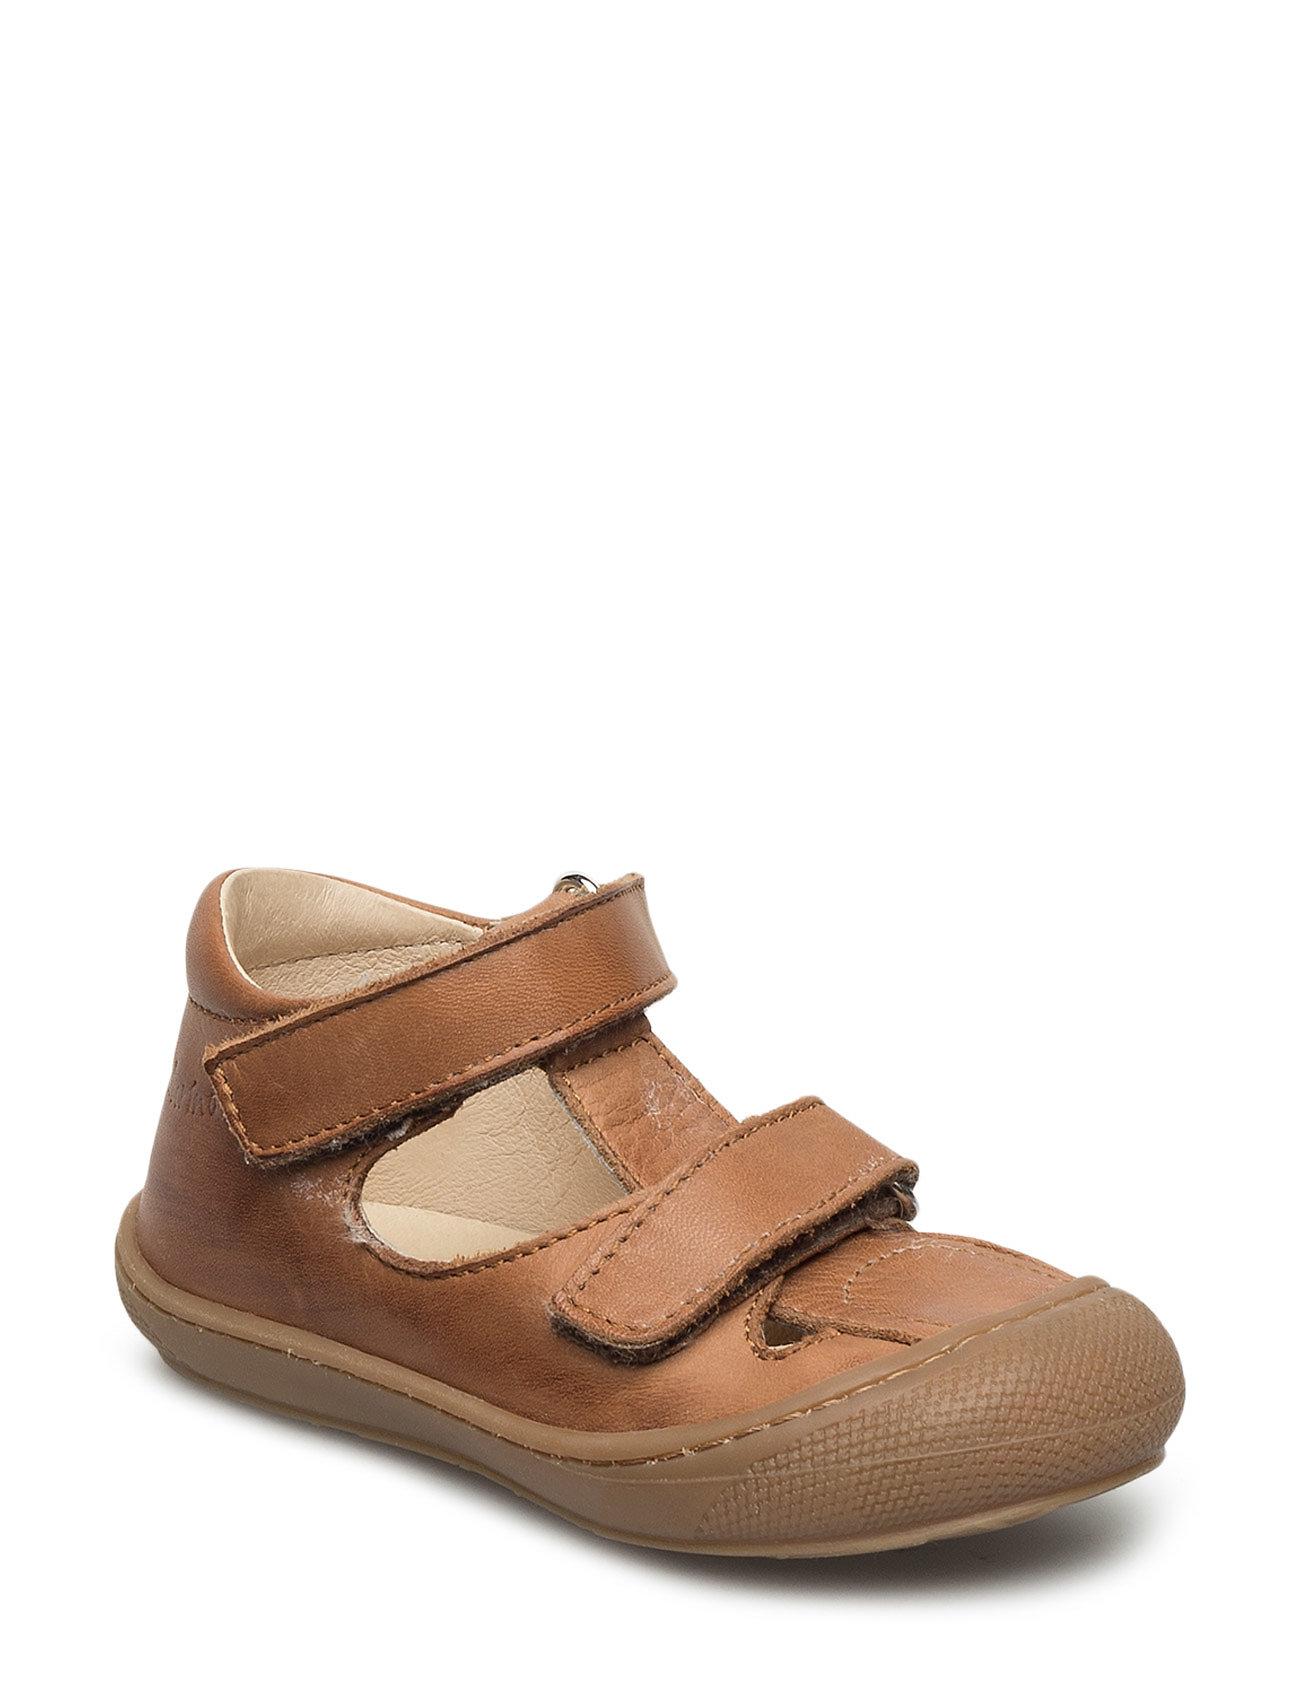 4e29b43503fd Naturino 3996 Naturino Sko   Sneakers til Børn i Brun